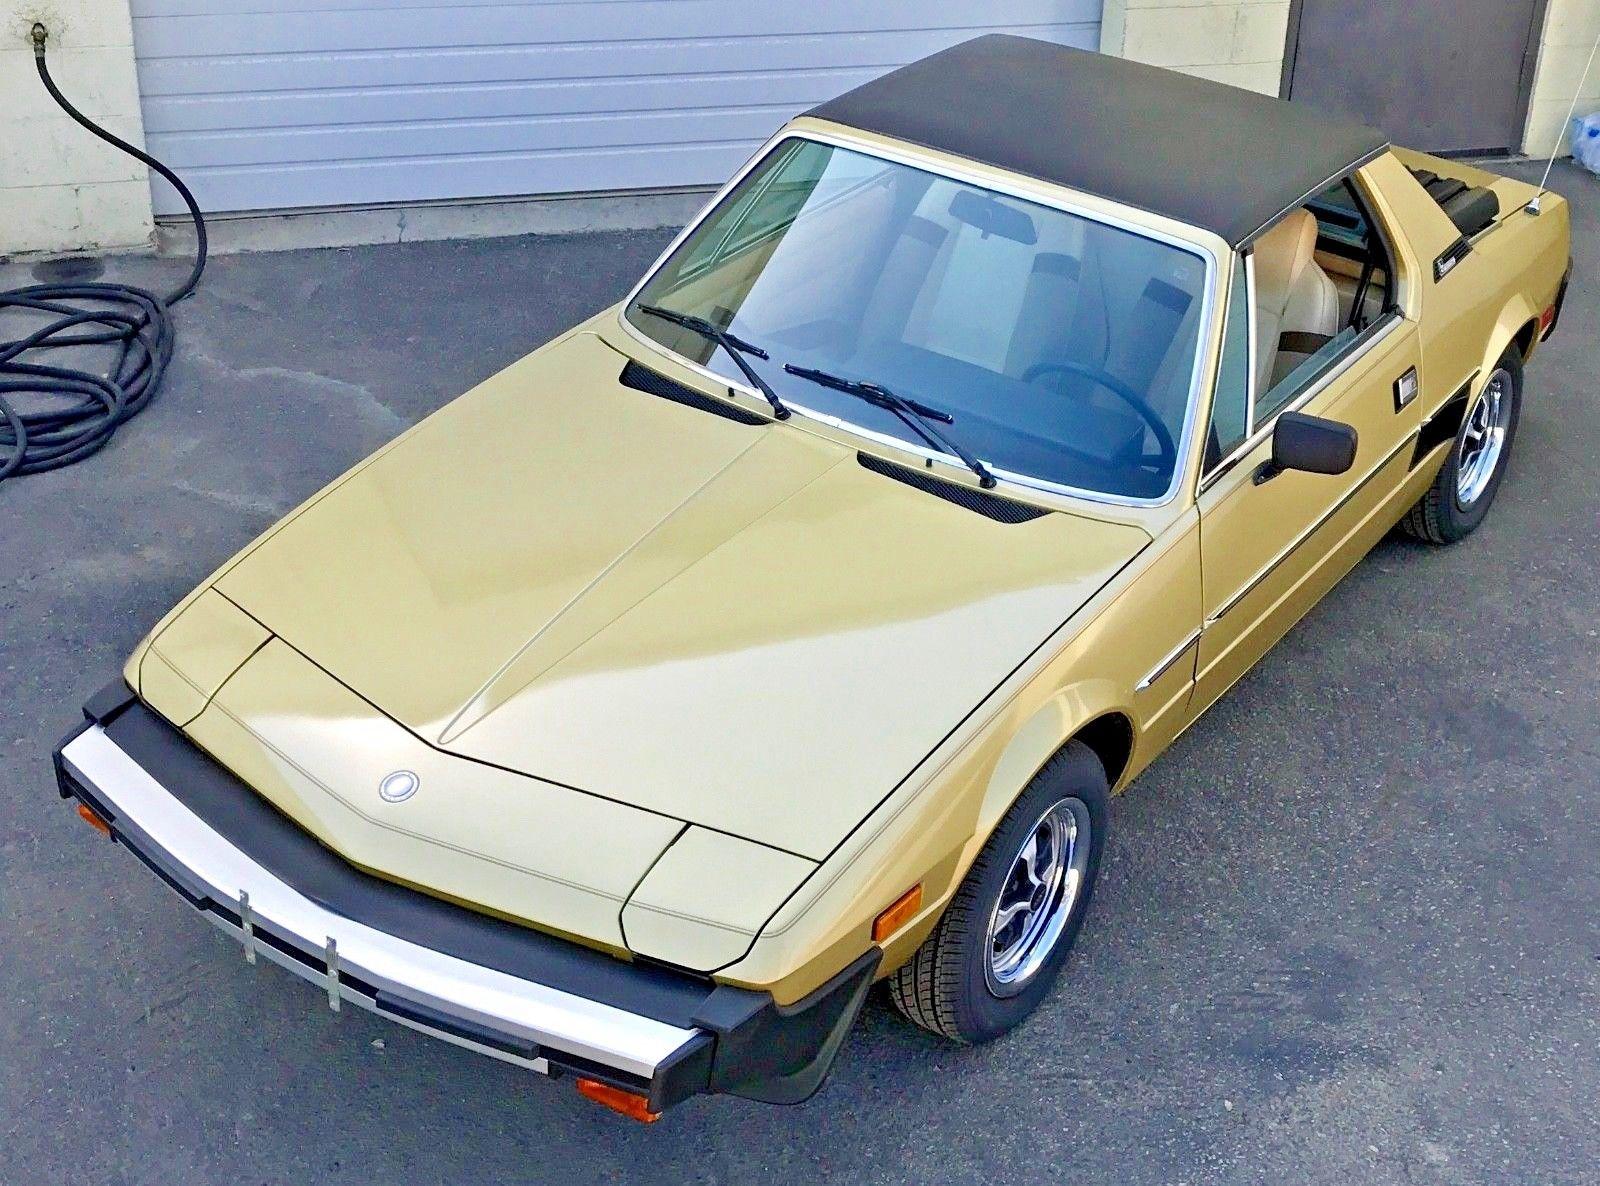 1979 Fiat X1/9 front 3/4